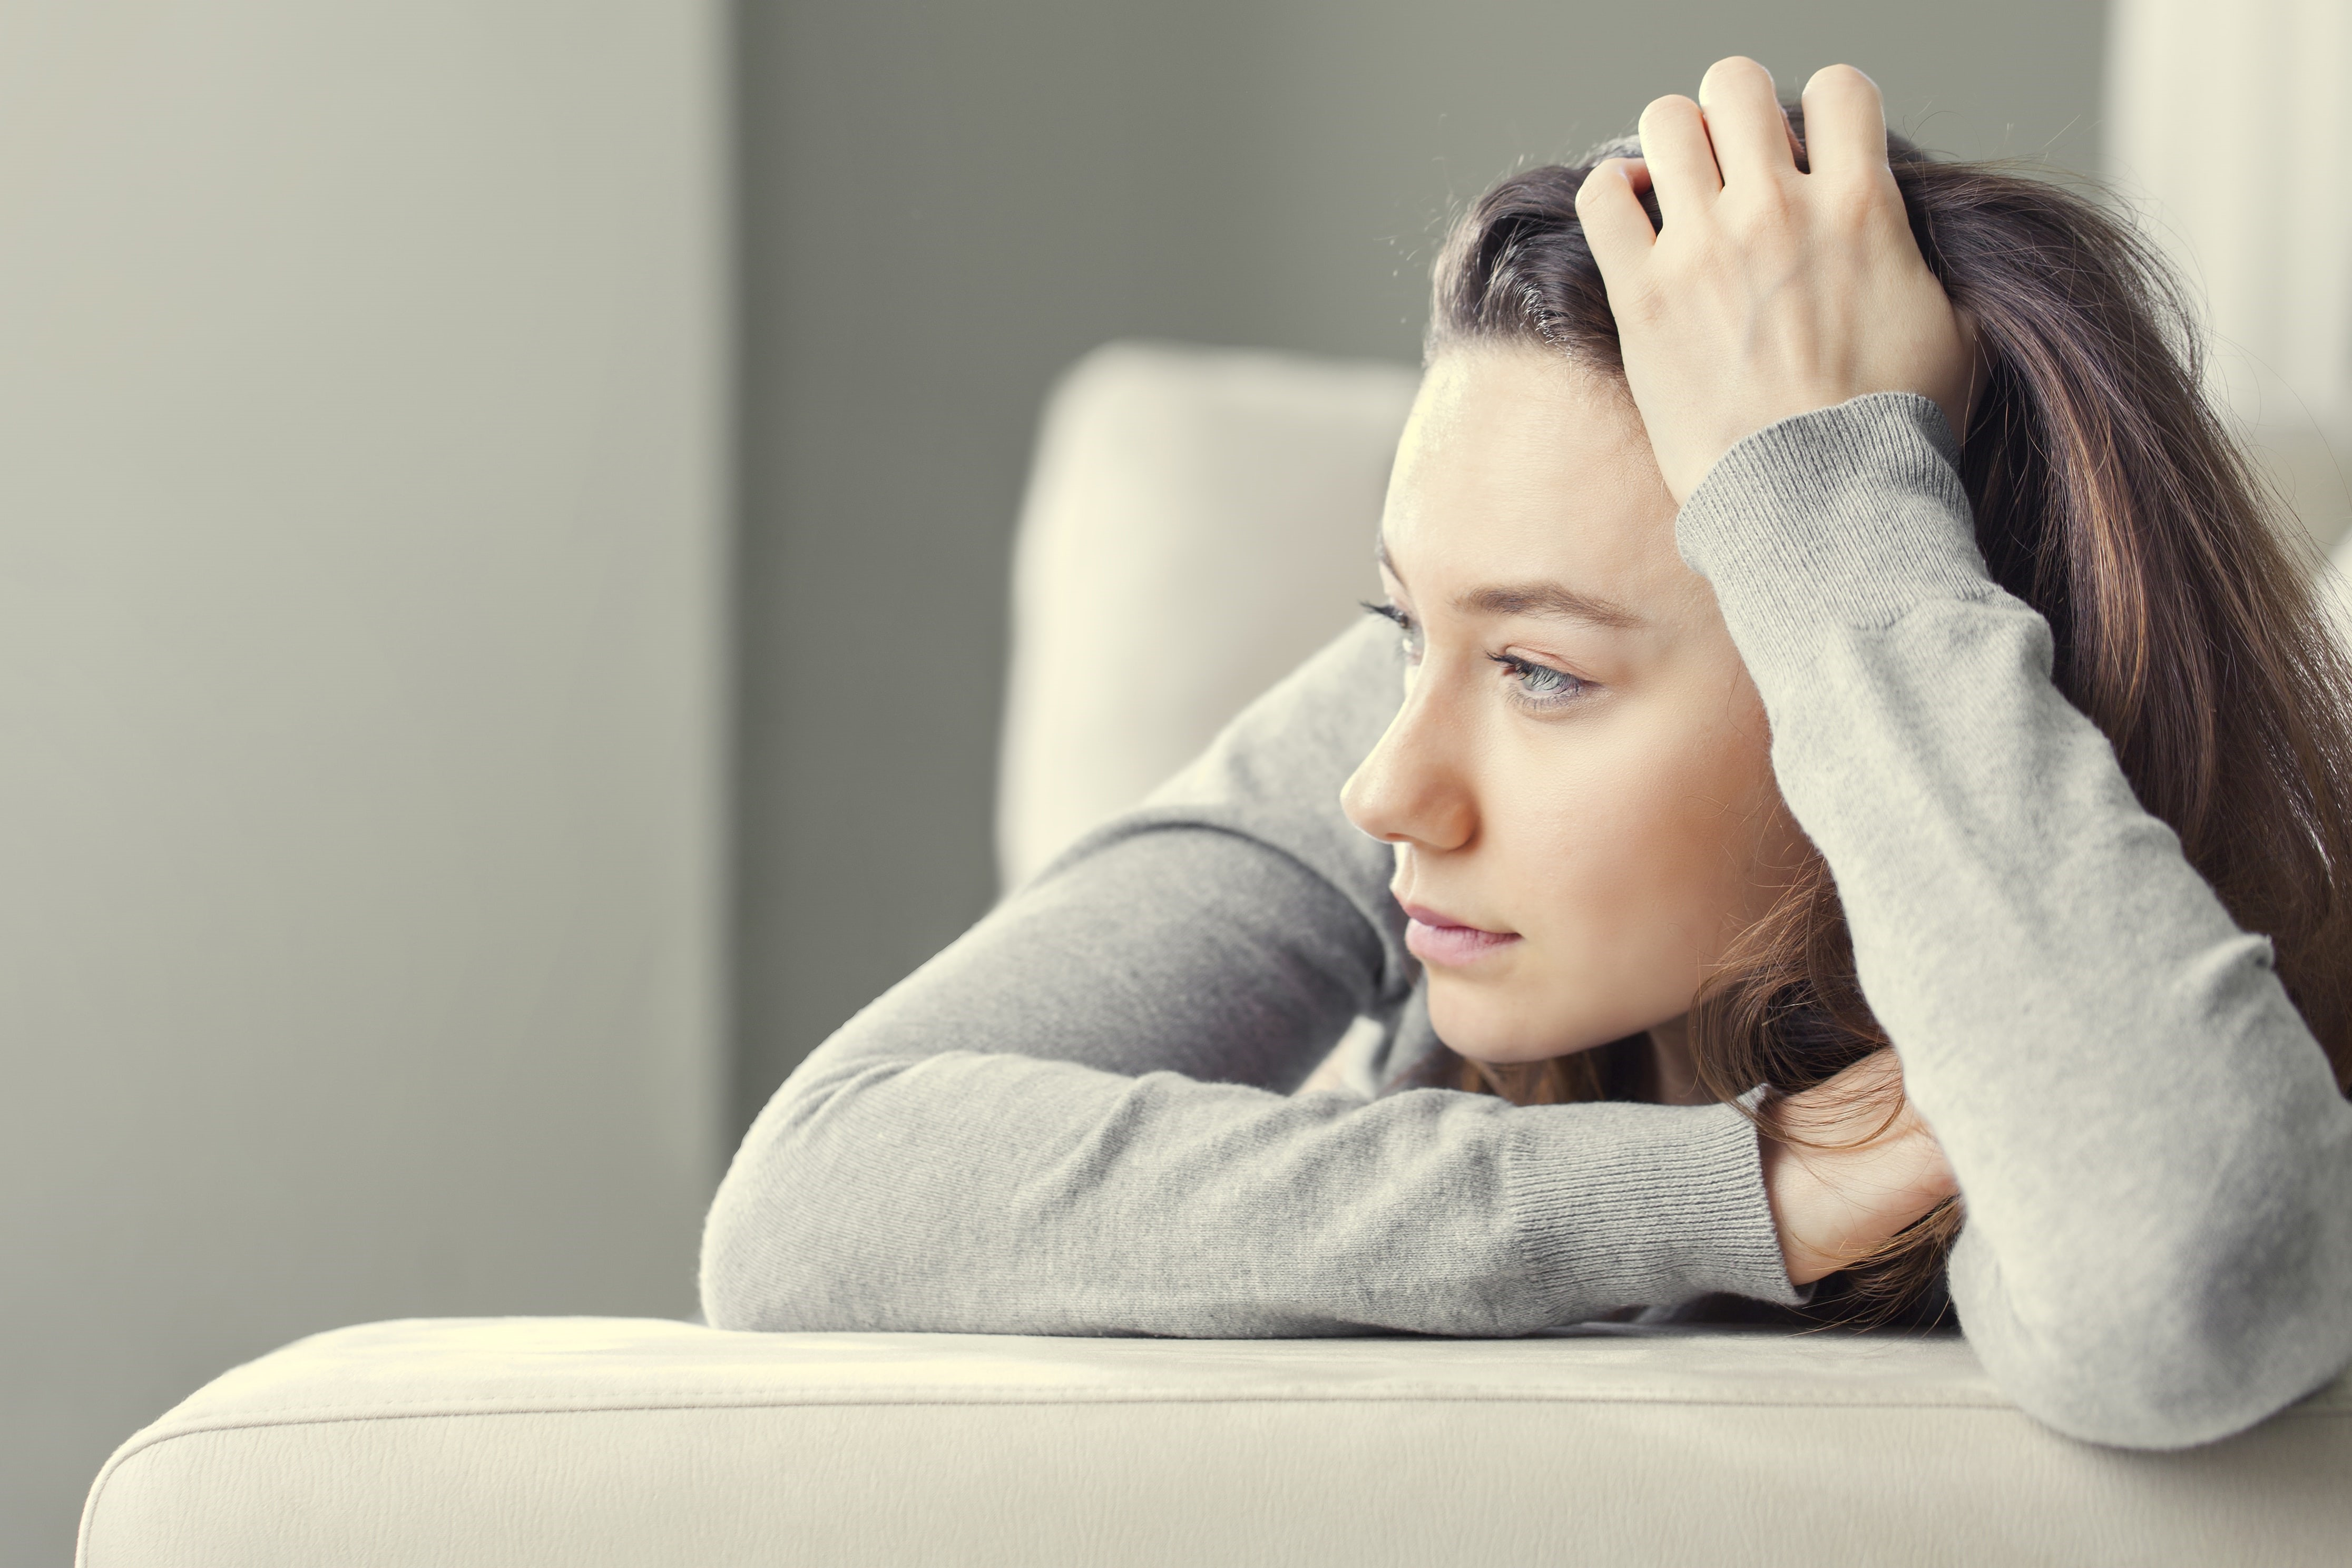 Endometriosis: When the disease controls your life